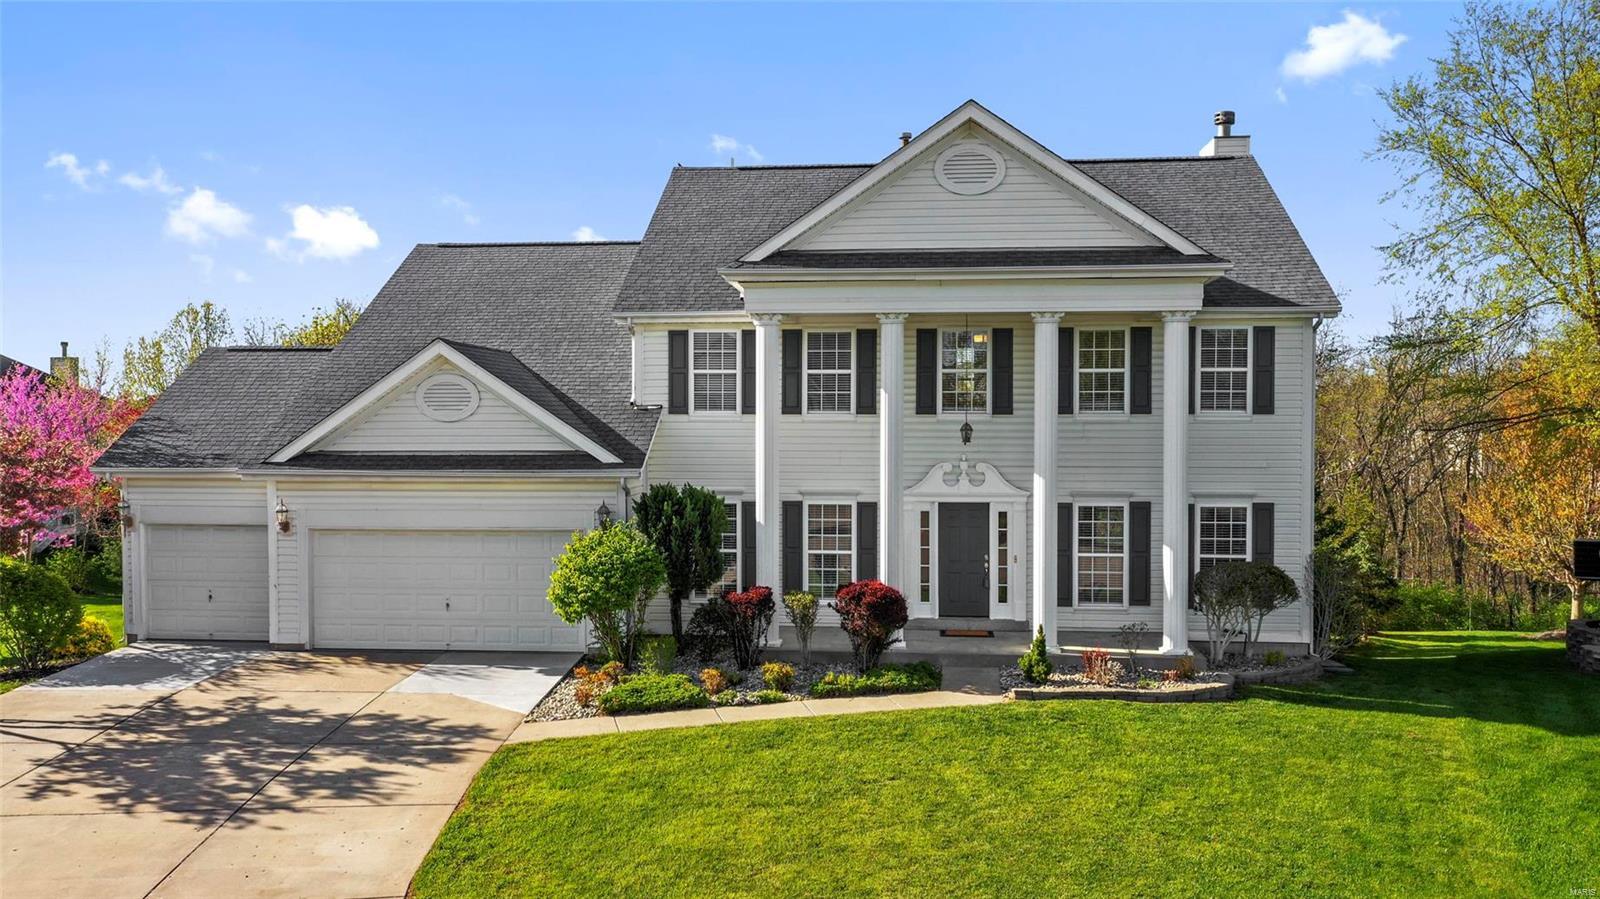 611 Knollshire Way Property Photo - Dardenne Prairie, MO real estate listing